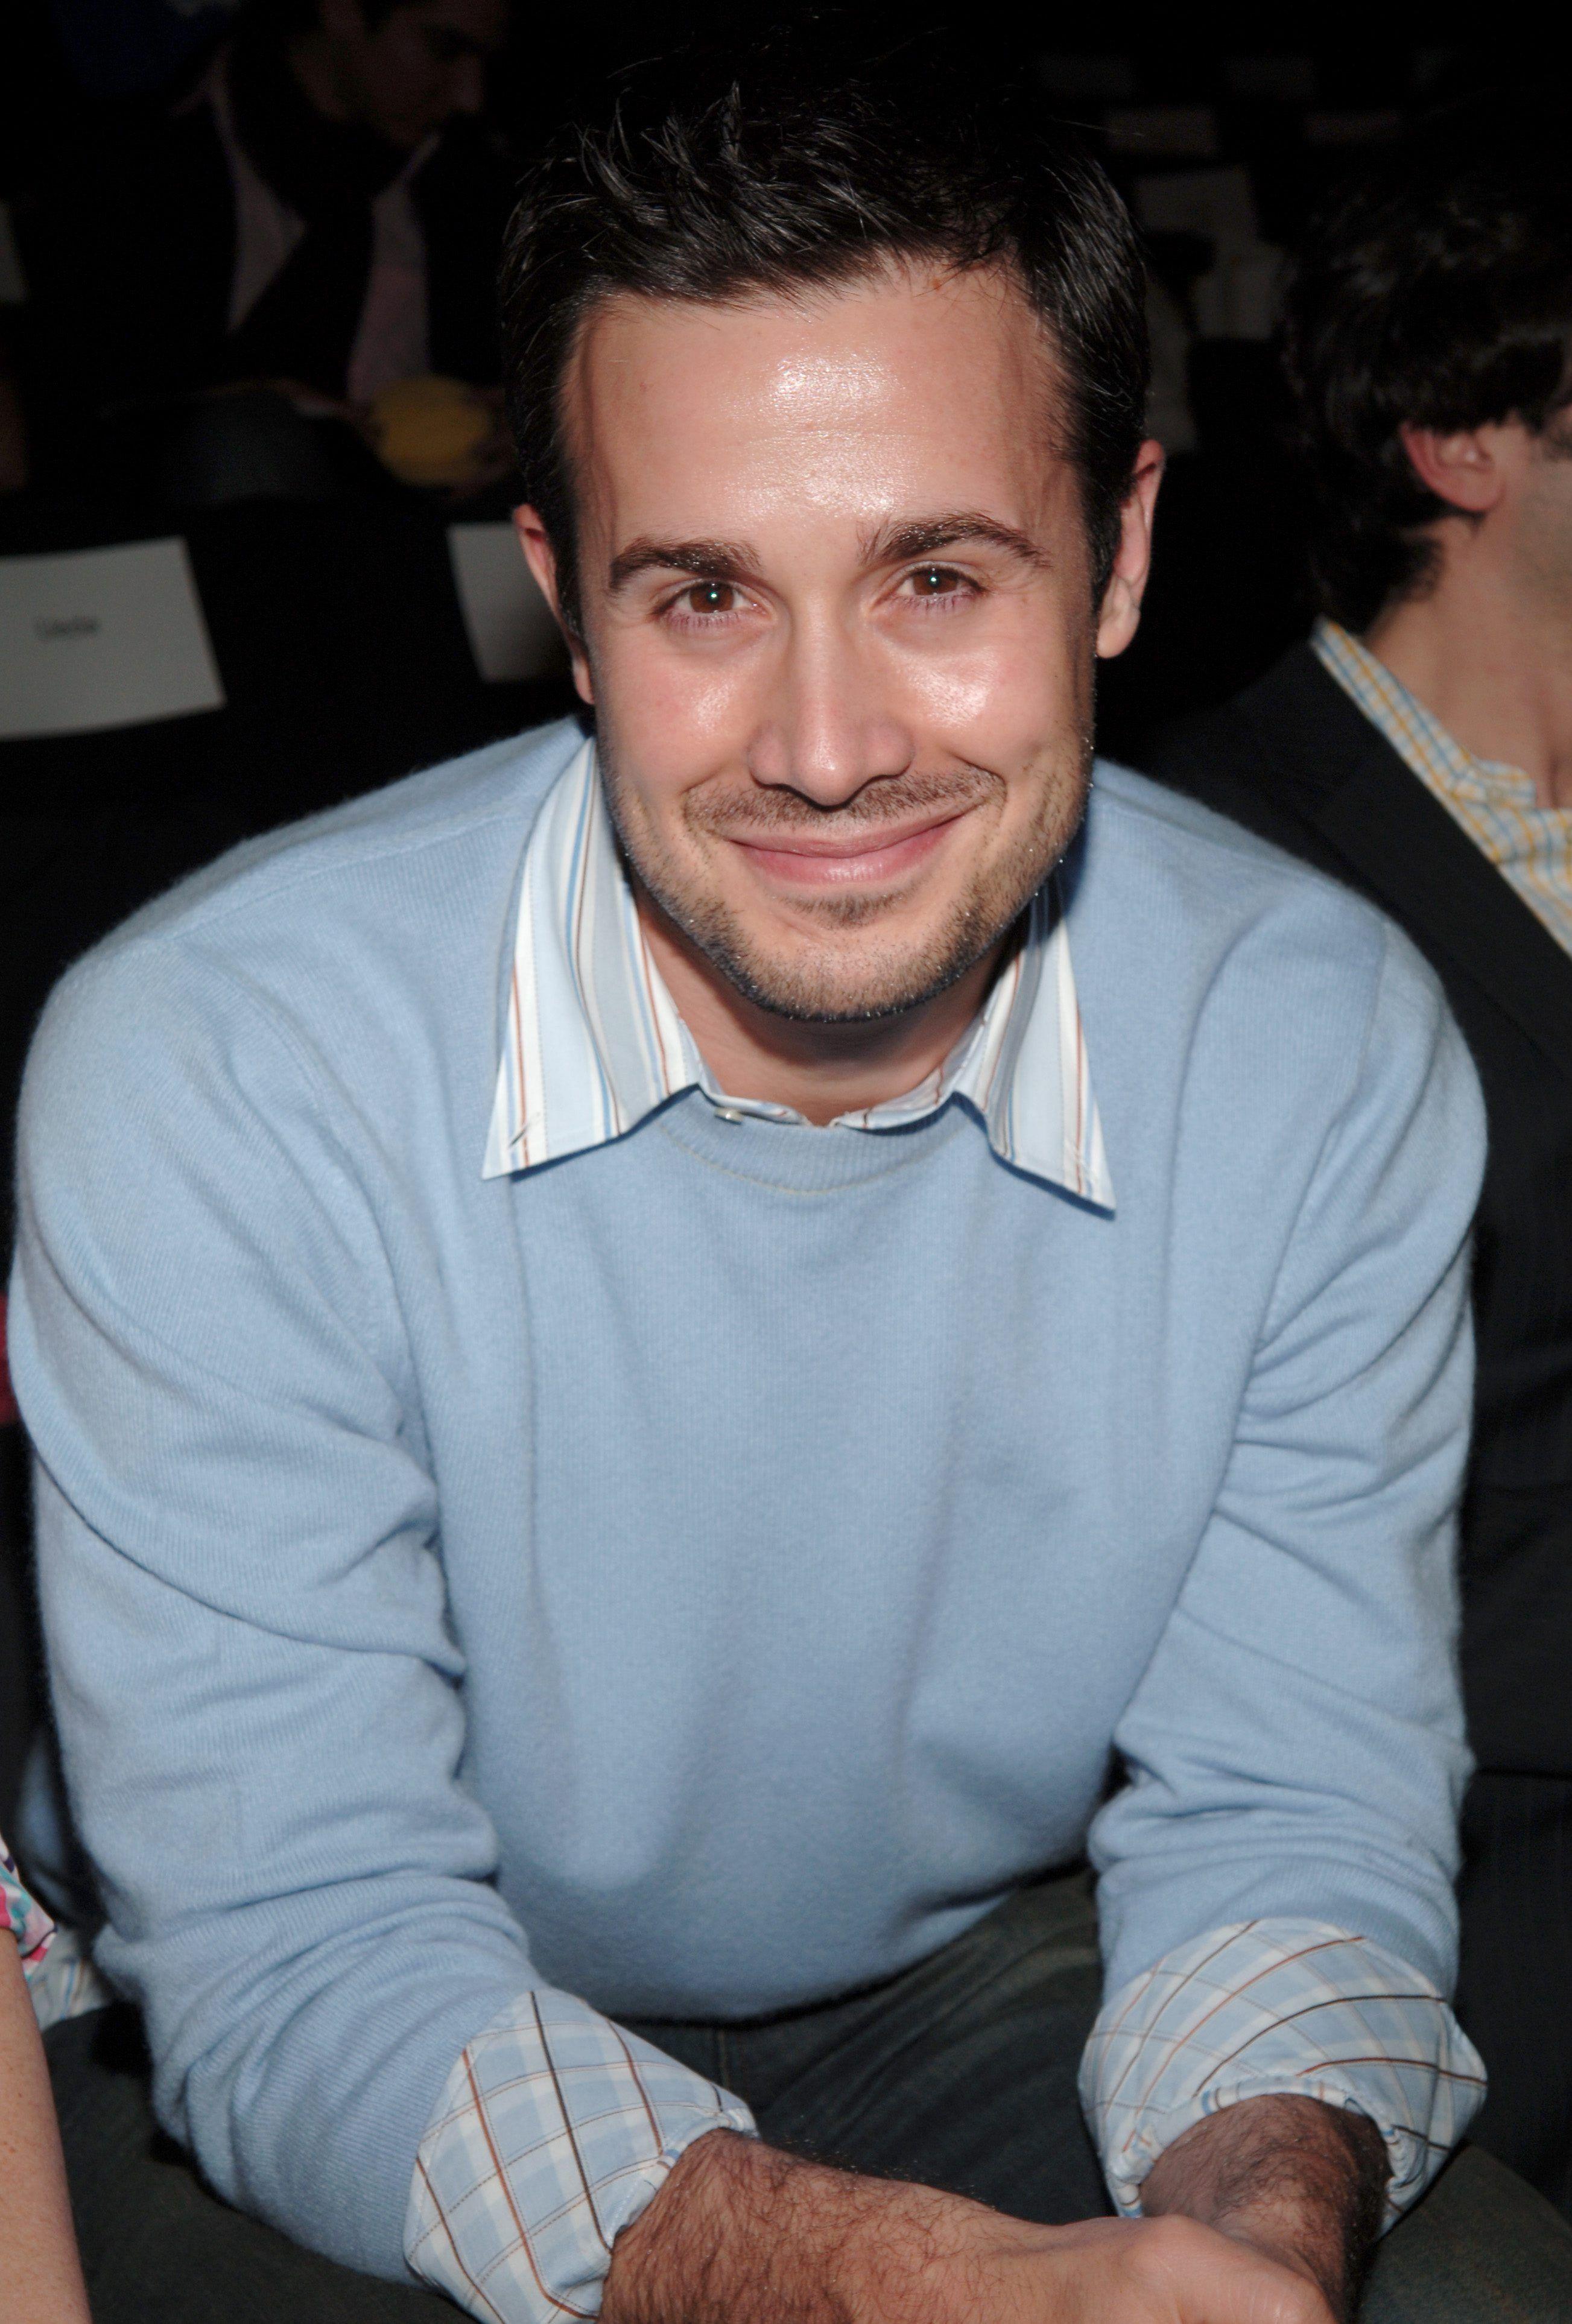 Freddie Prinze Jr. Cast As Punky's Ex-Husband In 'Punky Brewster' Sequel Series - Fame10